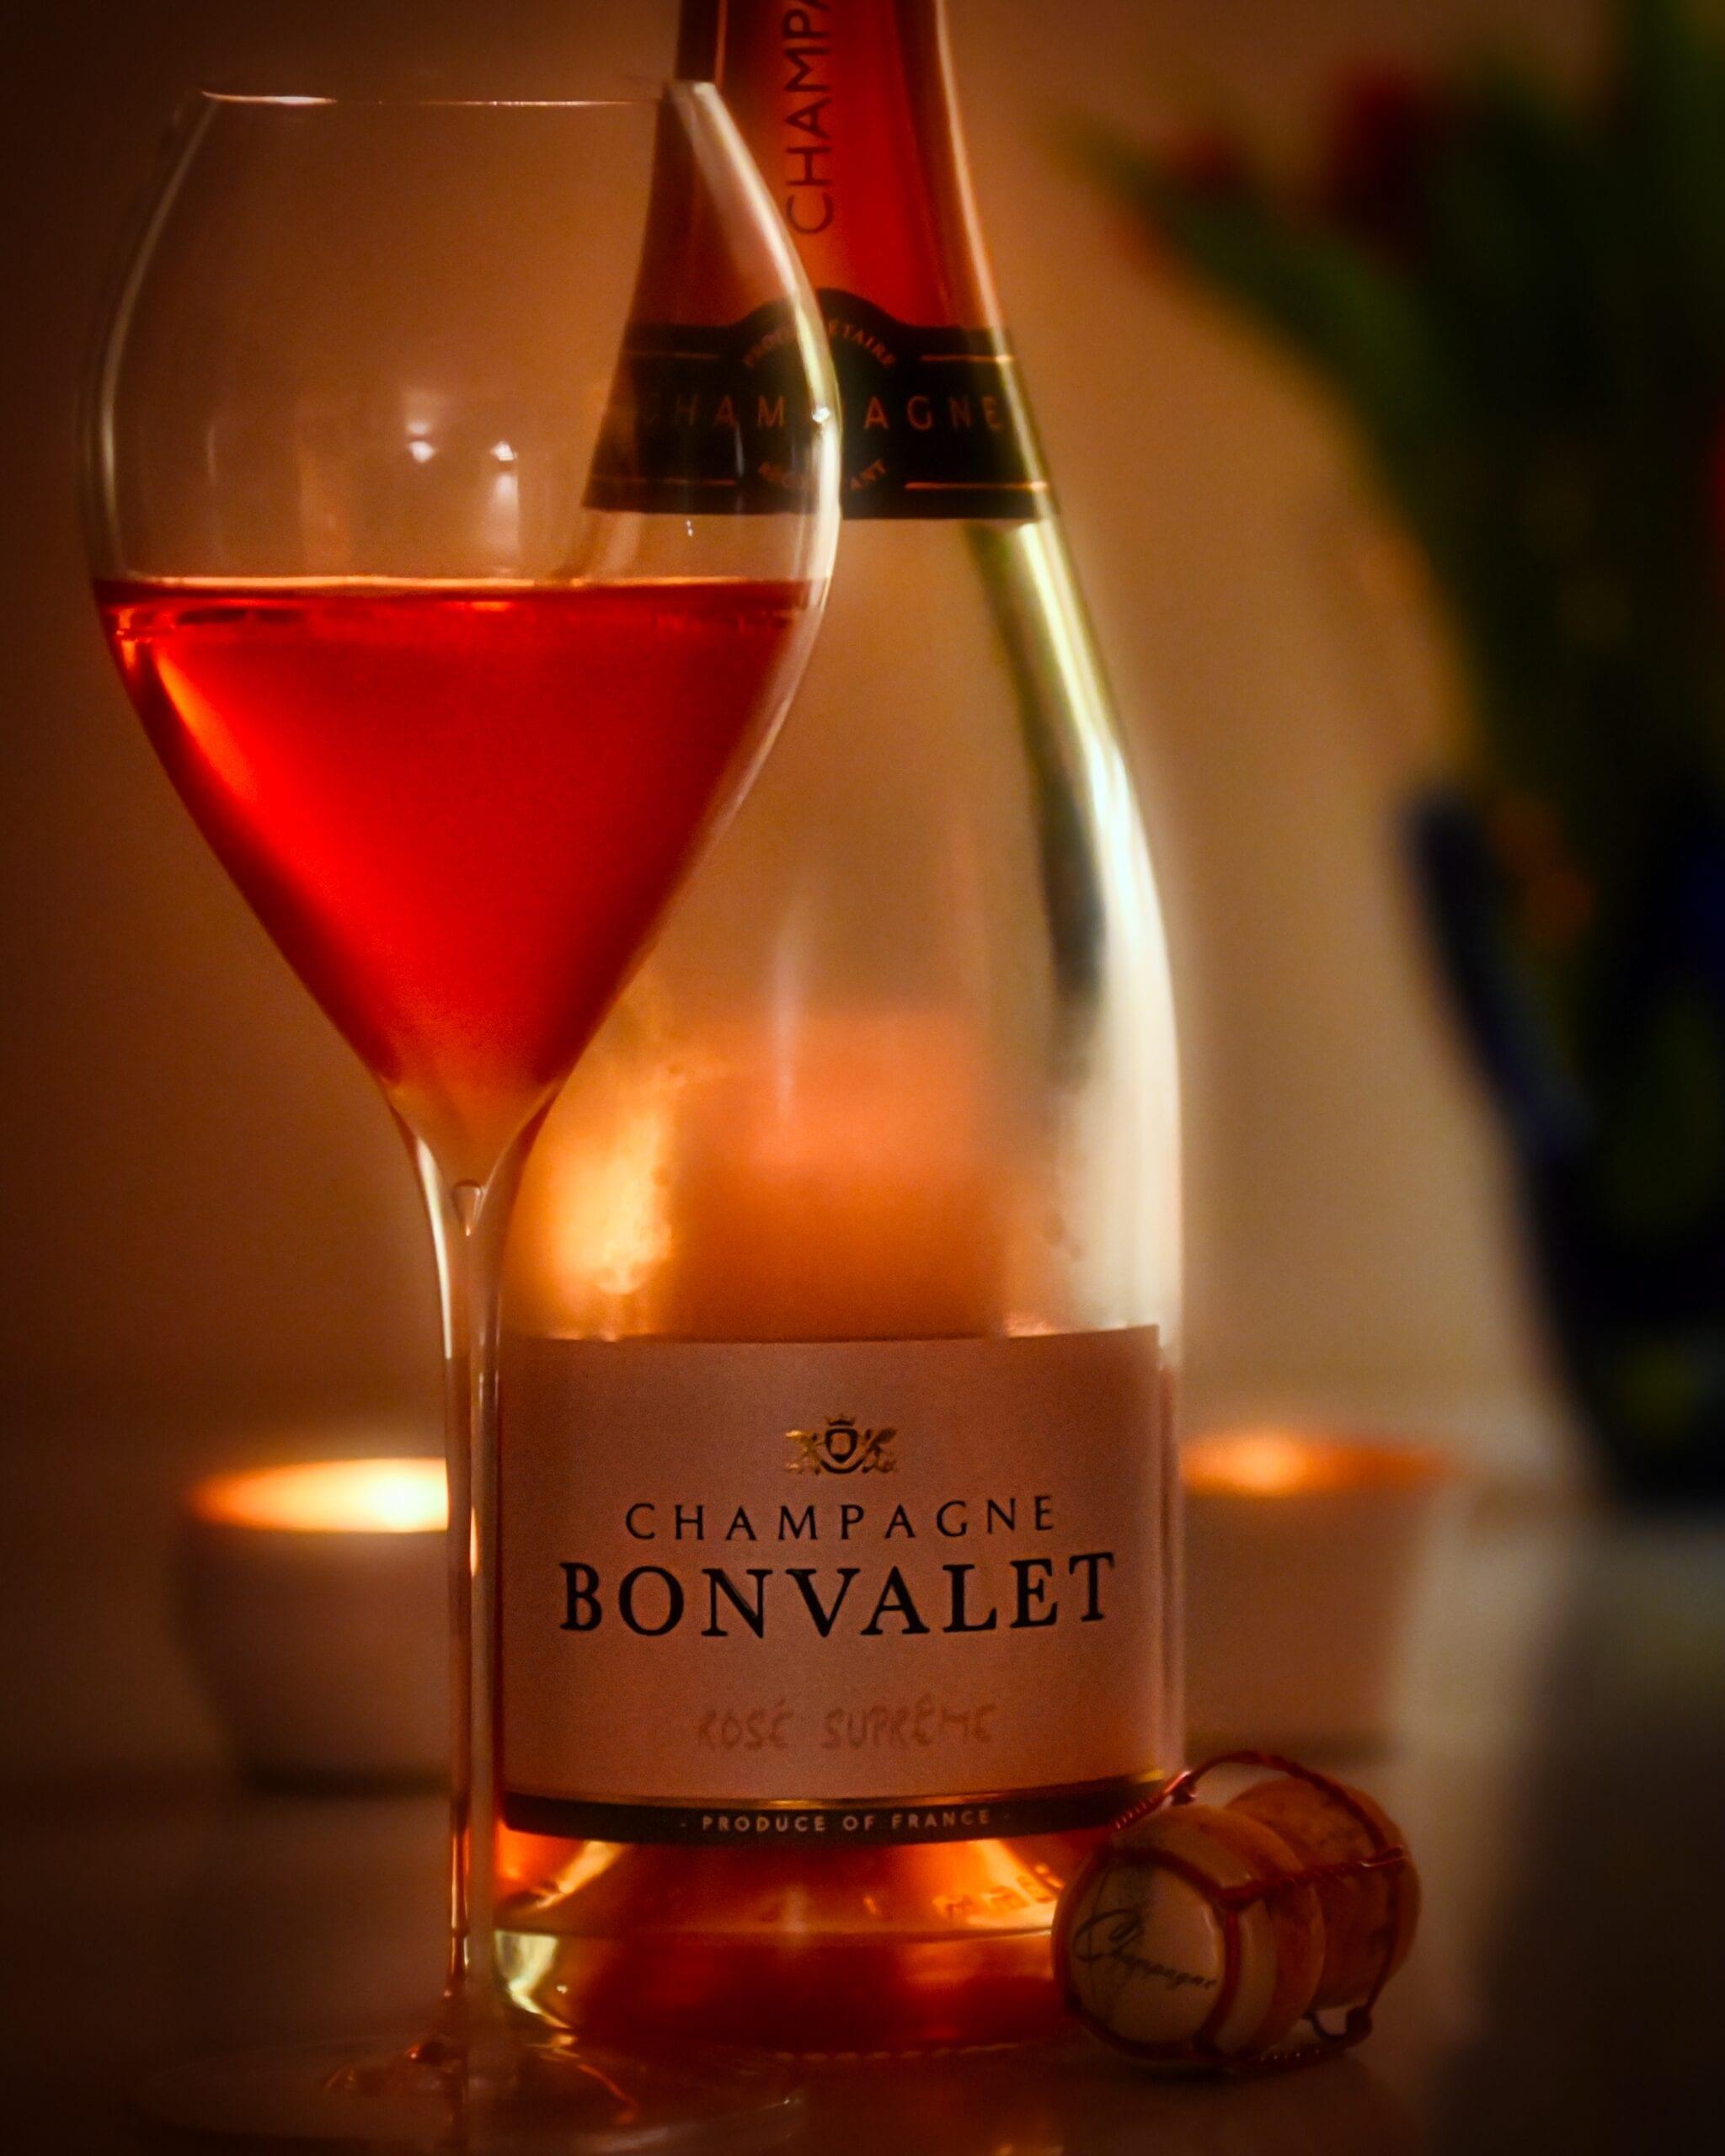 Bonvalet Rosé Suprême